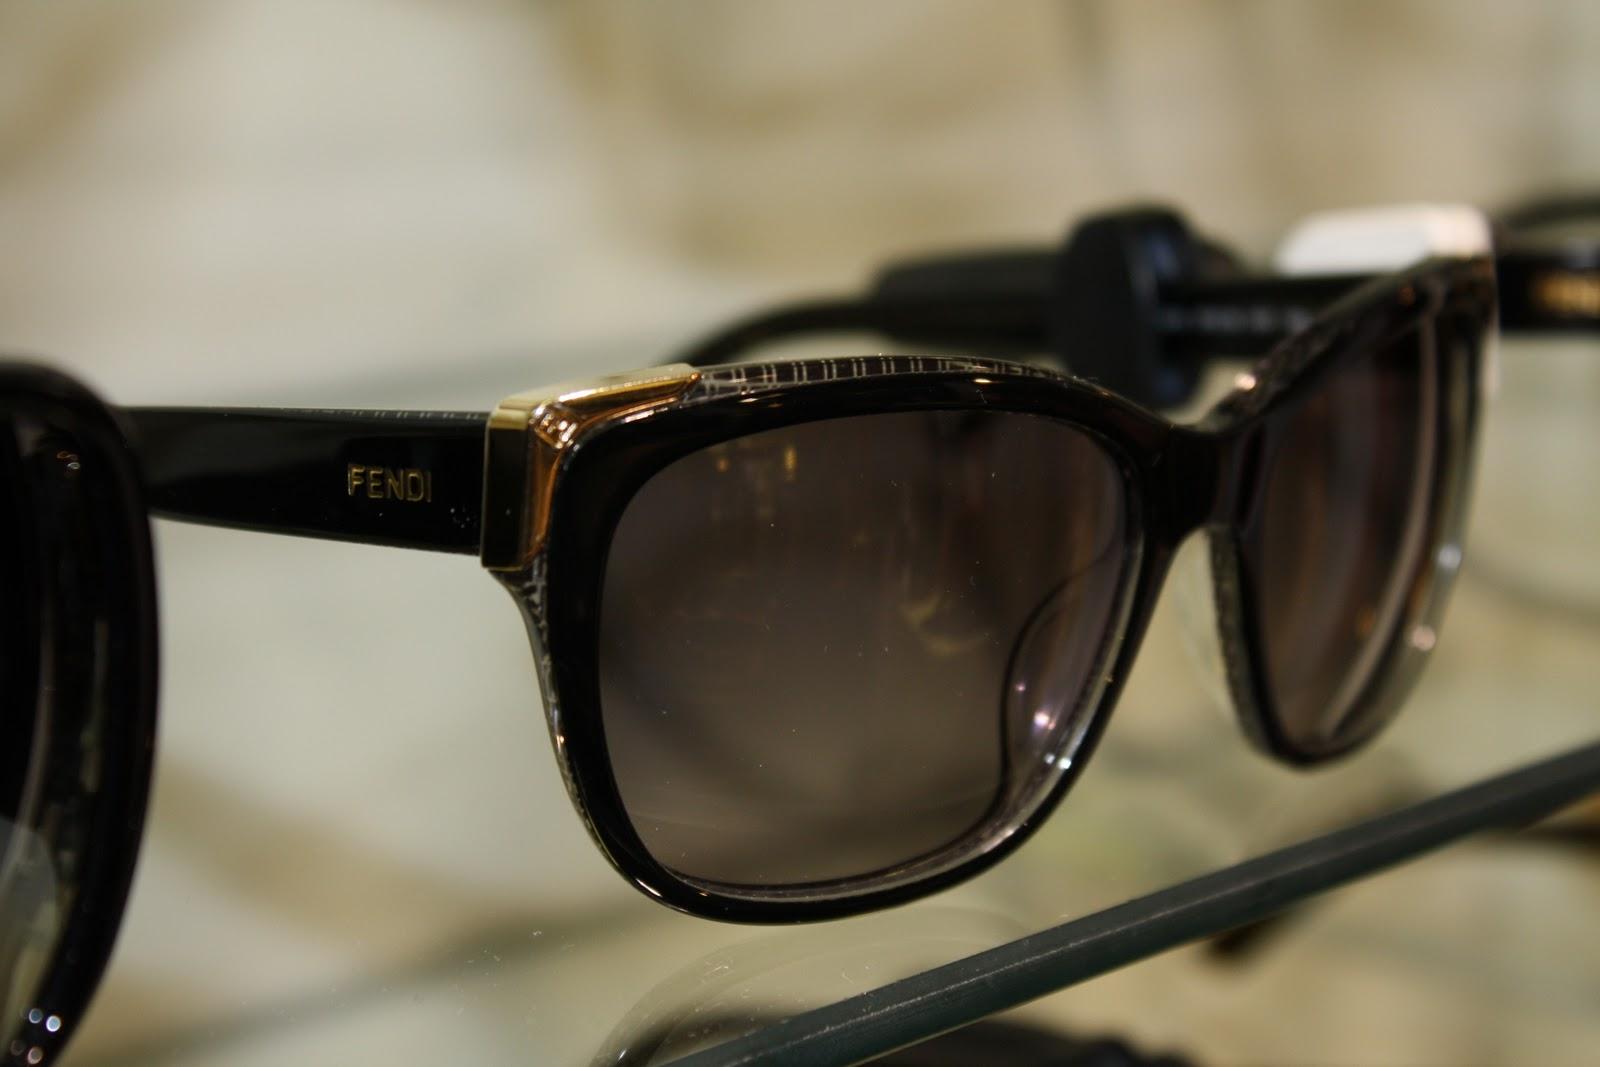 1555d8db5fa Fendi Glasses event A W 2012 – Bunnipunch